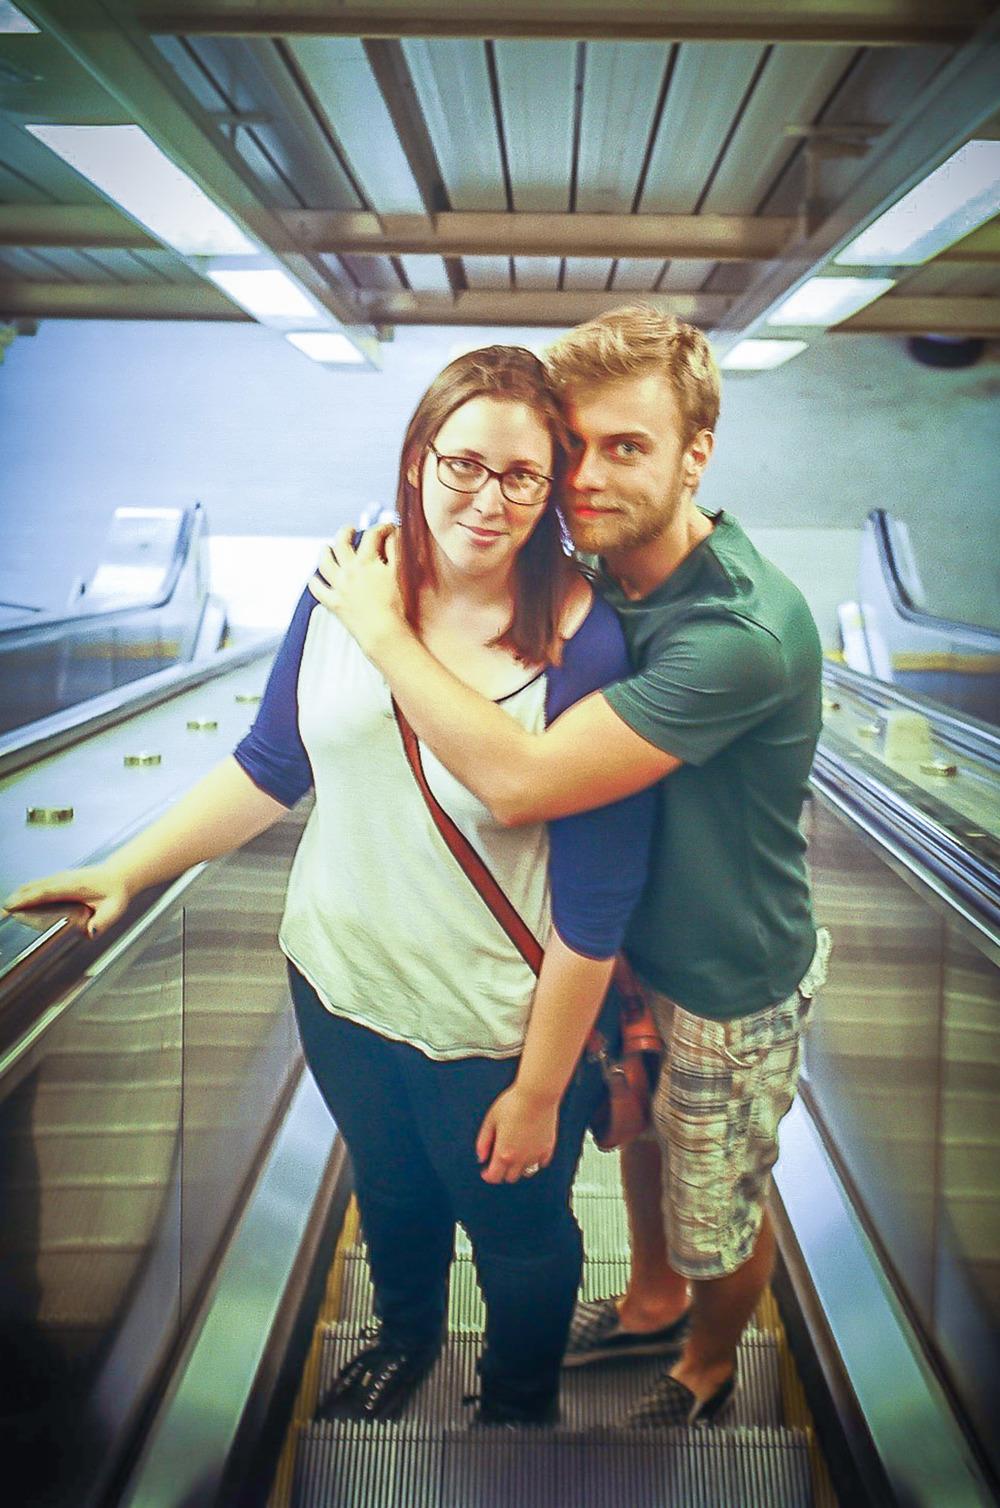 We rode escalators.